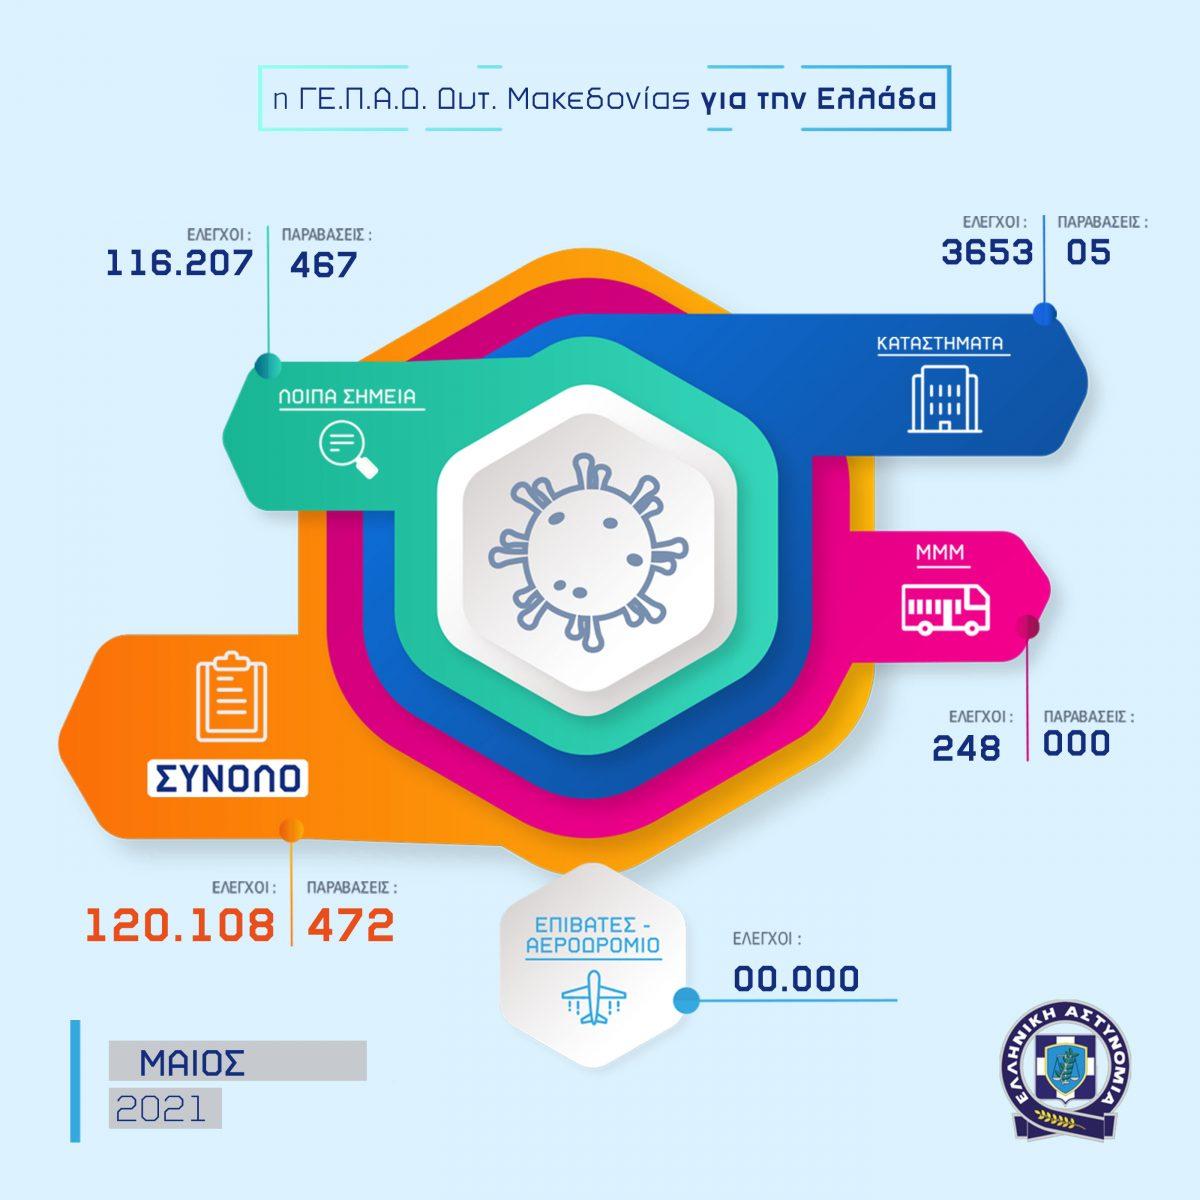 06062021gepaddytmakedonias infographic 002